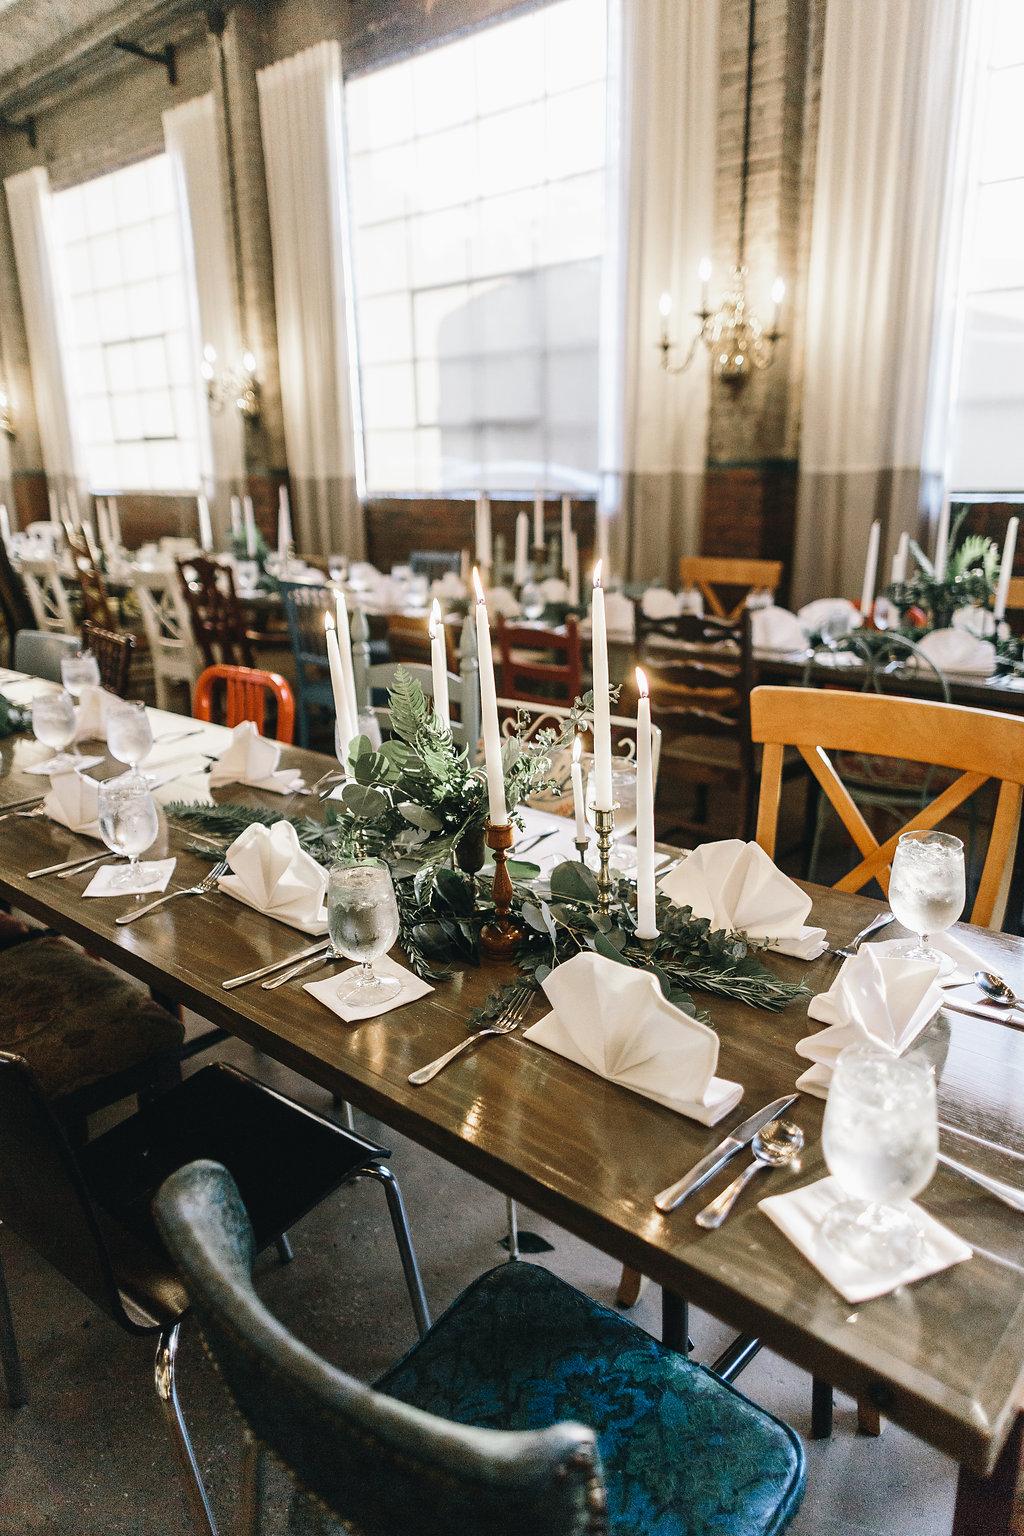 shannon-britt-mackensey-alexander-photography-green-wedding-shoes-ivory-and-beau-bridal-boutique-savannah-wedding-planner-savannah-bridal-boutique-savannah-wedding-dresses-savannah-florist-summer-solstice-wedding-boho-soho-south-cafe-wedding-63.jpg